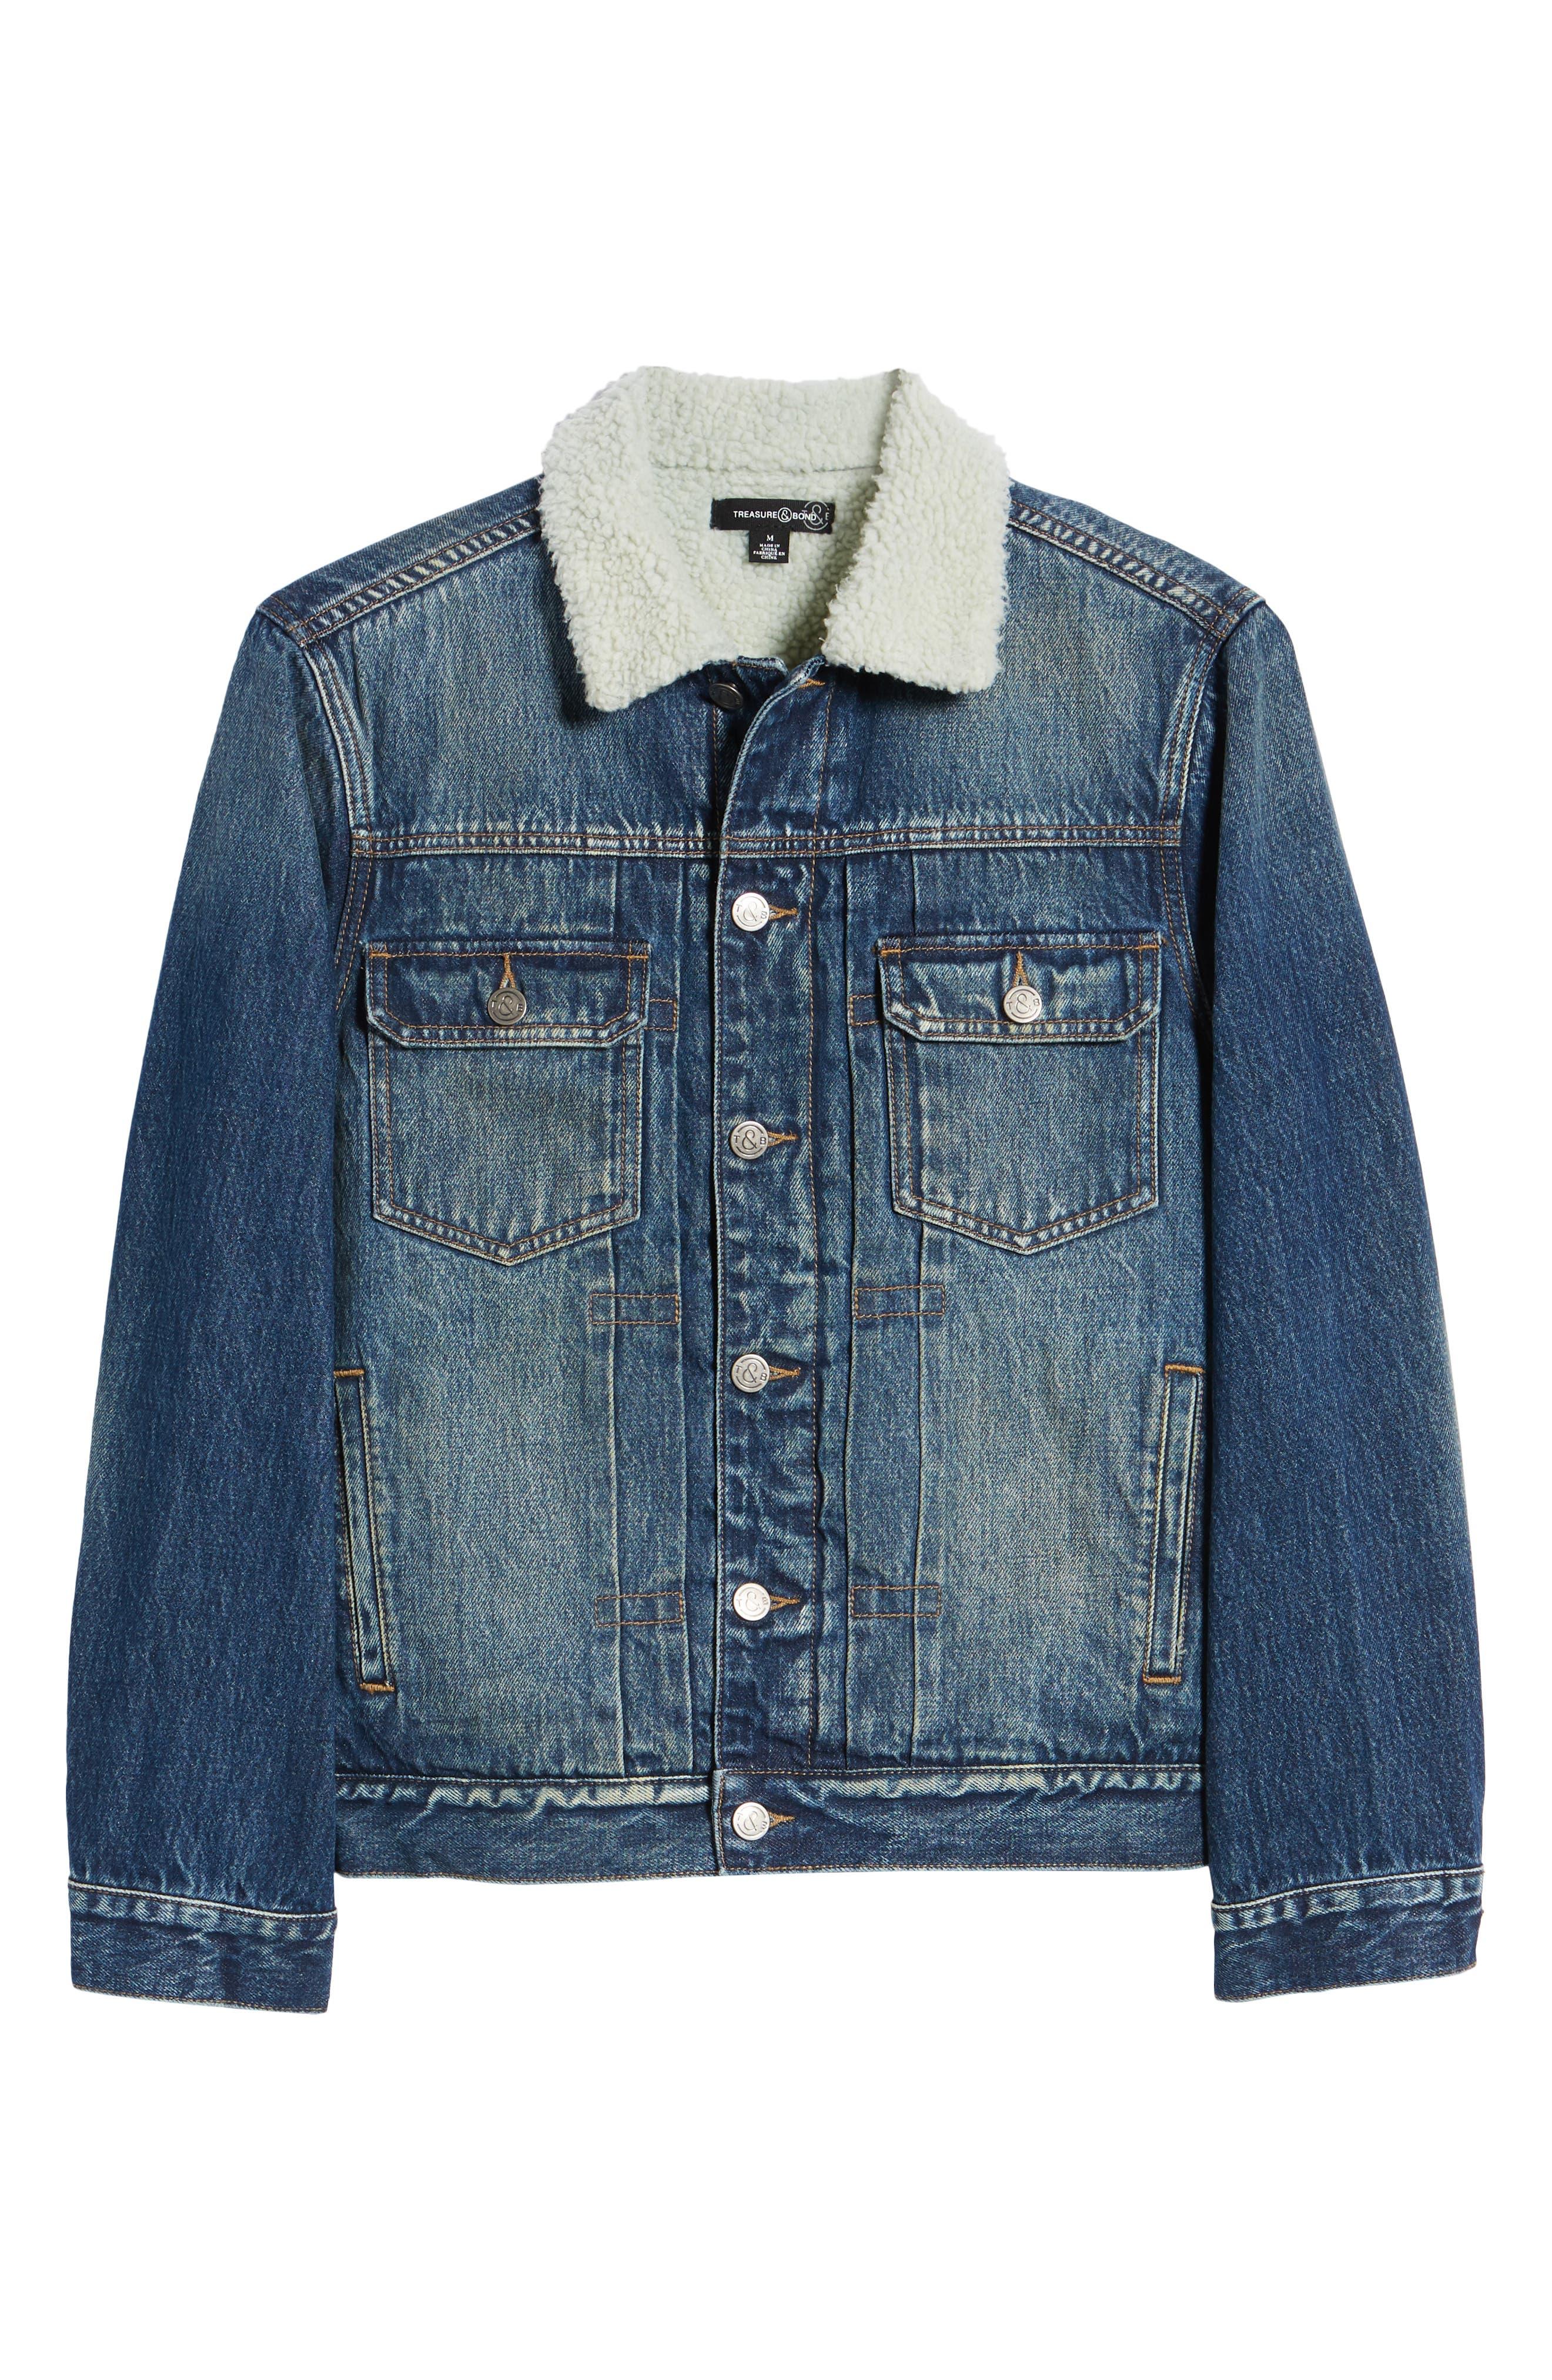 Denim Jacket with Faux Shearling Collar,                             Alternate thumbnail 6, color,                             BLUE MEDIUM DENIM